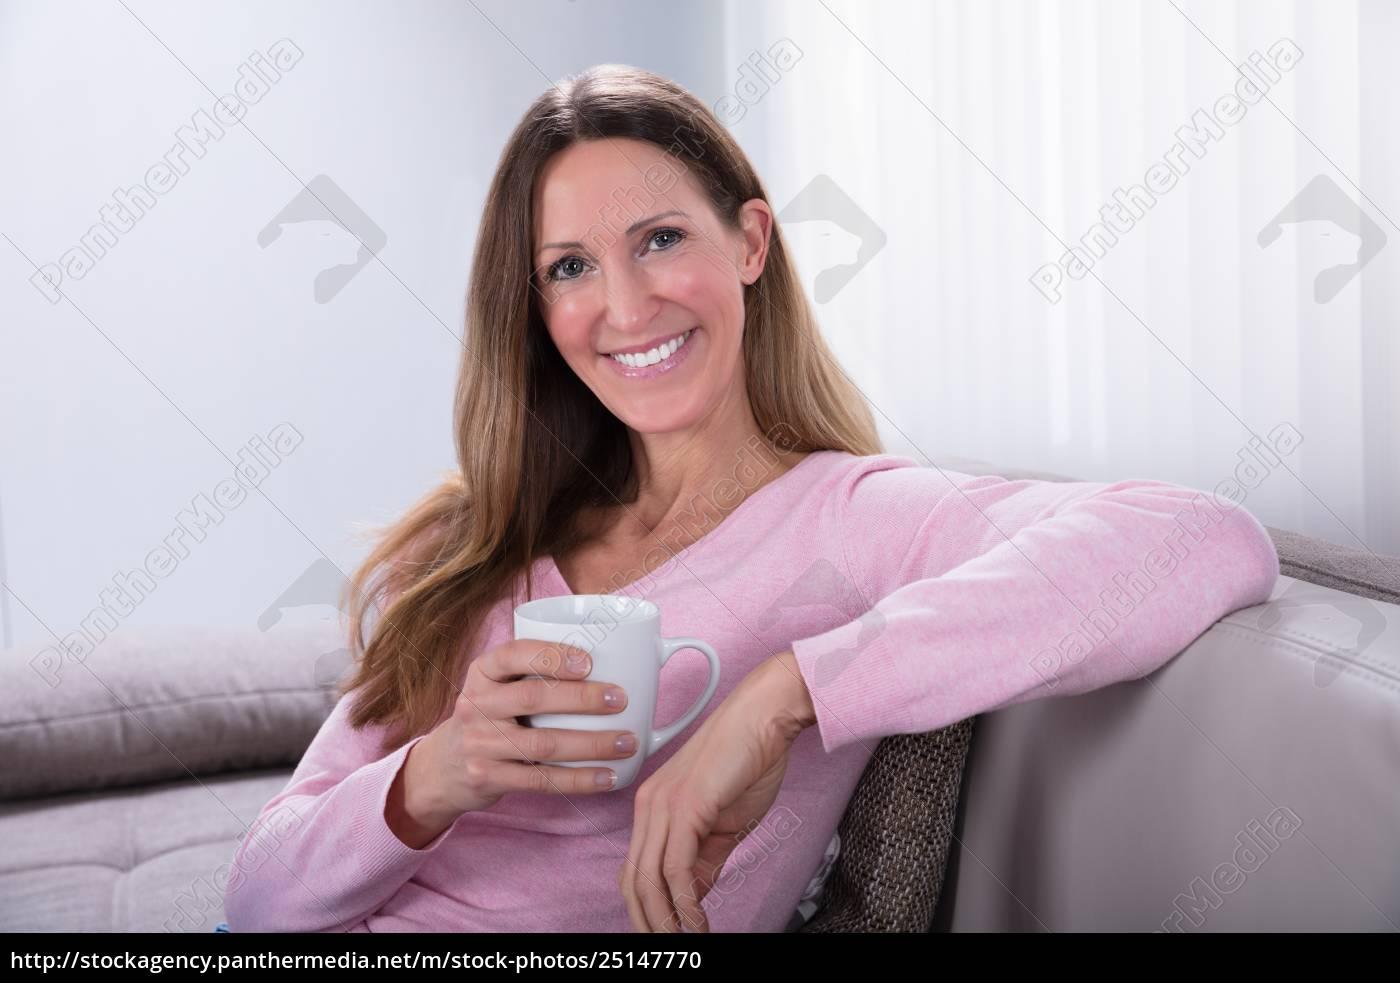 happy, woman, sitting, on, sofa, holding - 25147770